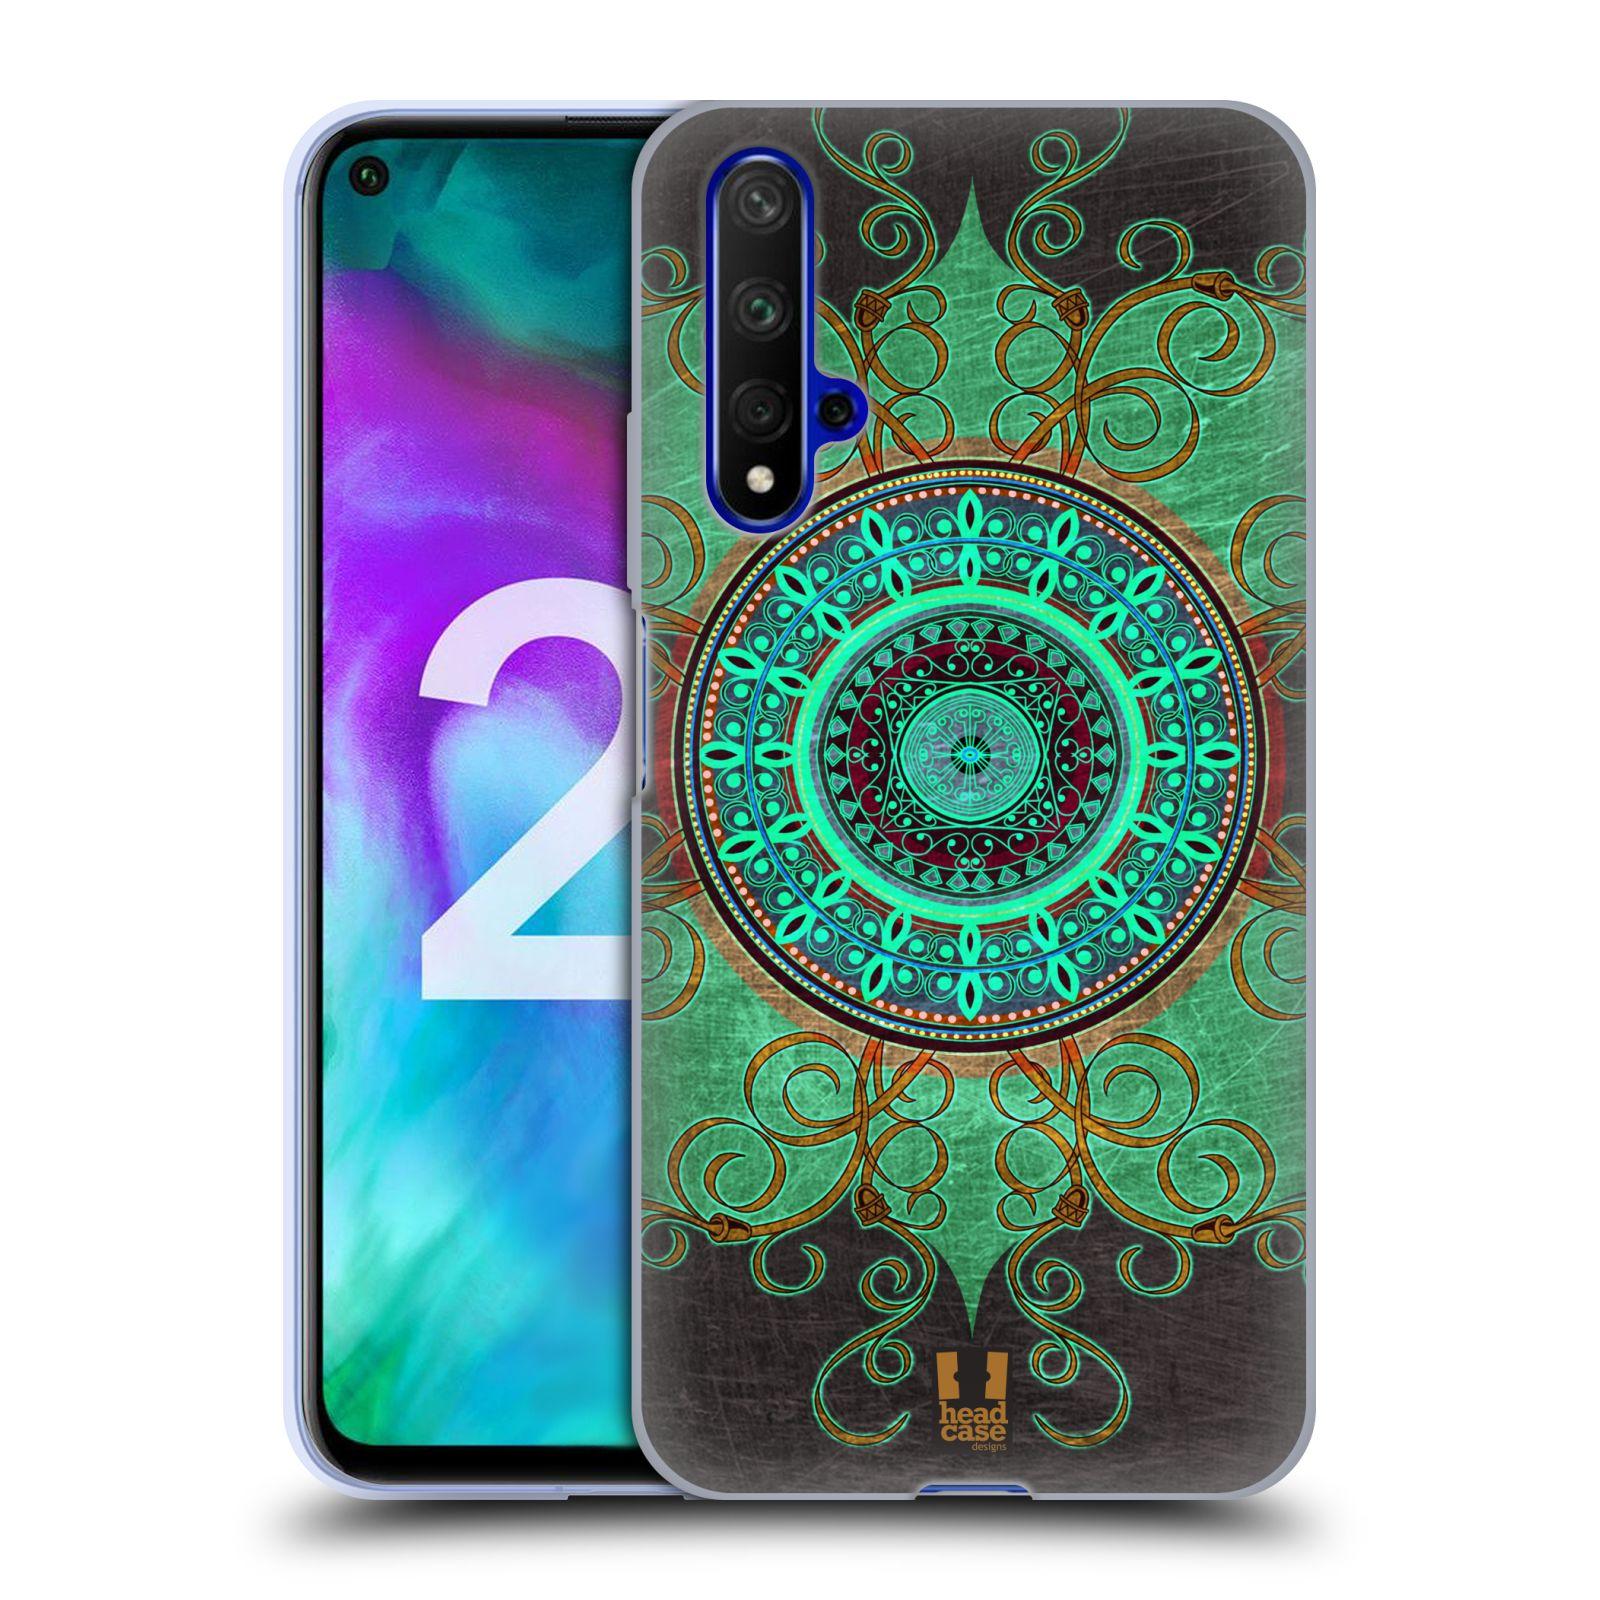 Silikonové pouzdro na mobil Honor 20 - Head Case - ARAB MANDALA